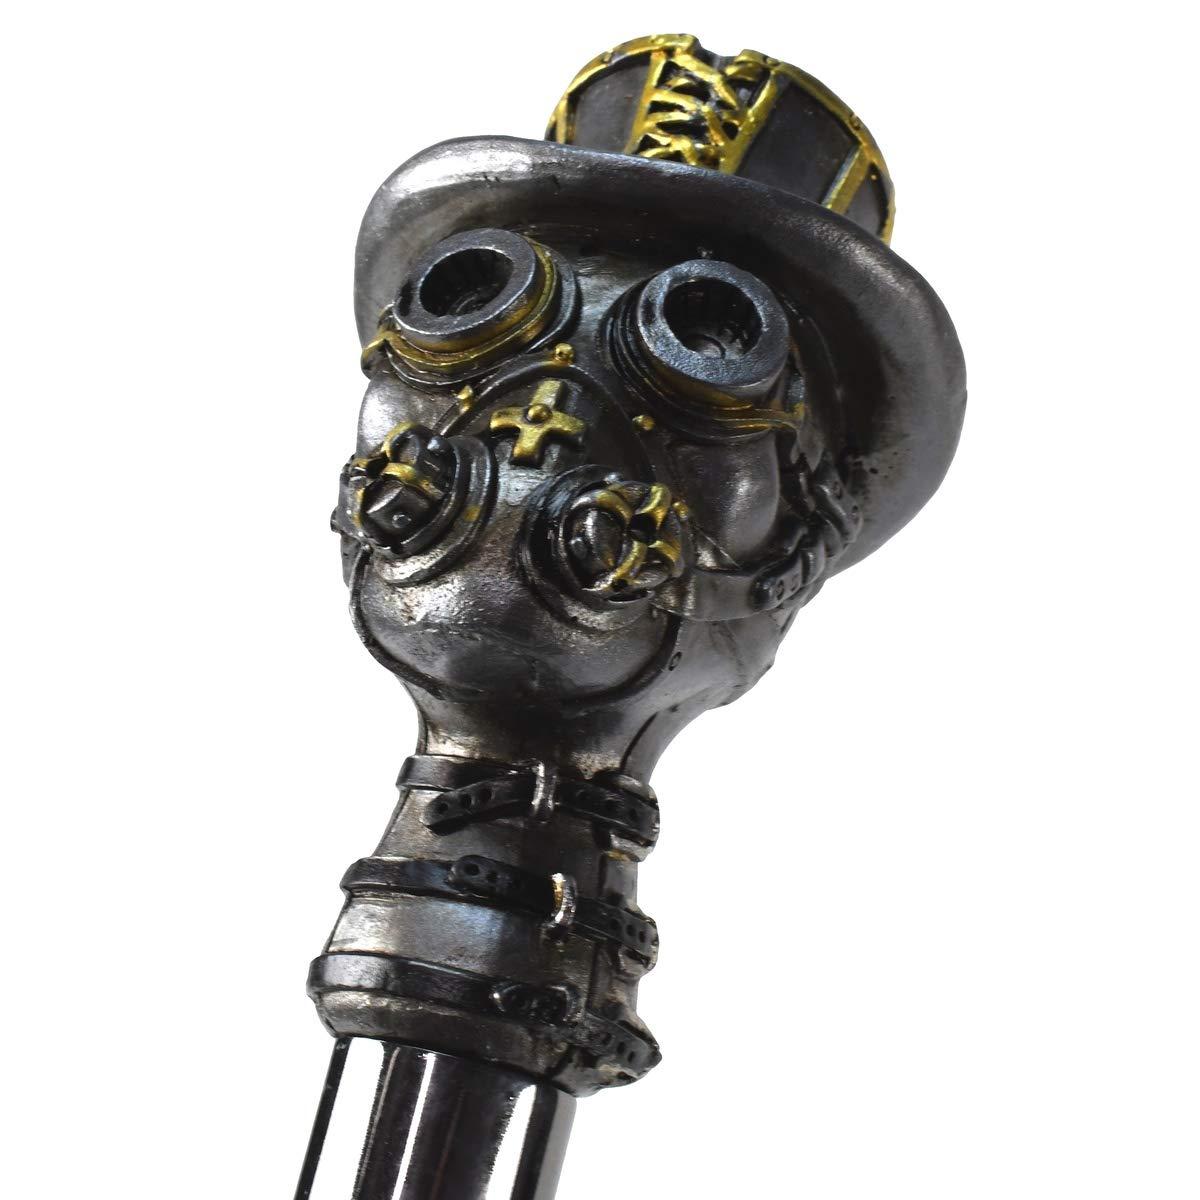 Punk Skull Wearing Gas Mask Buckle Collar Walking Stick Metal Shaft Steampunk Cane Black by TG,LLC